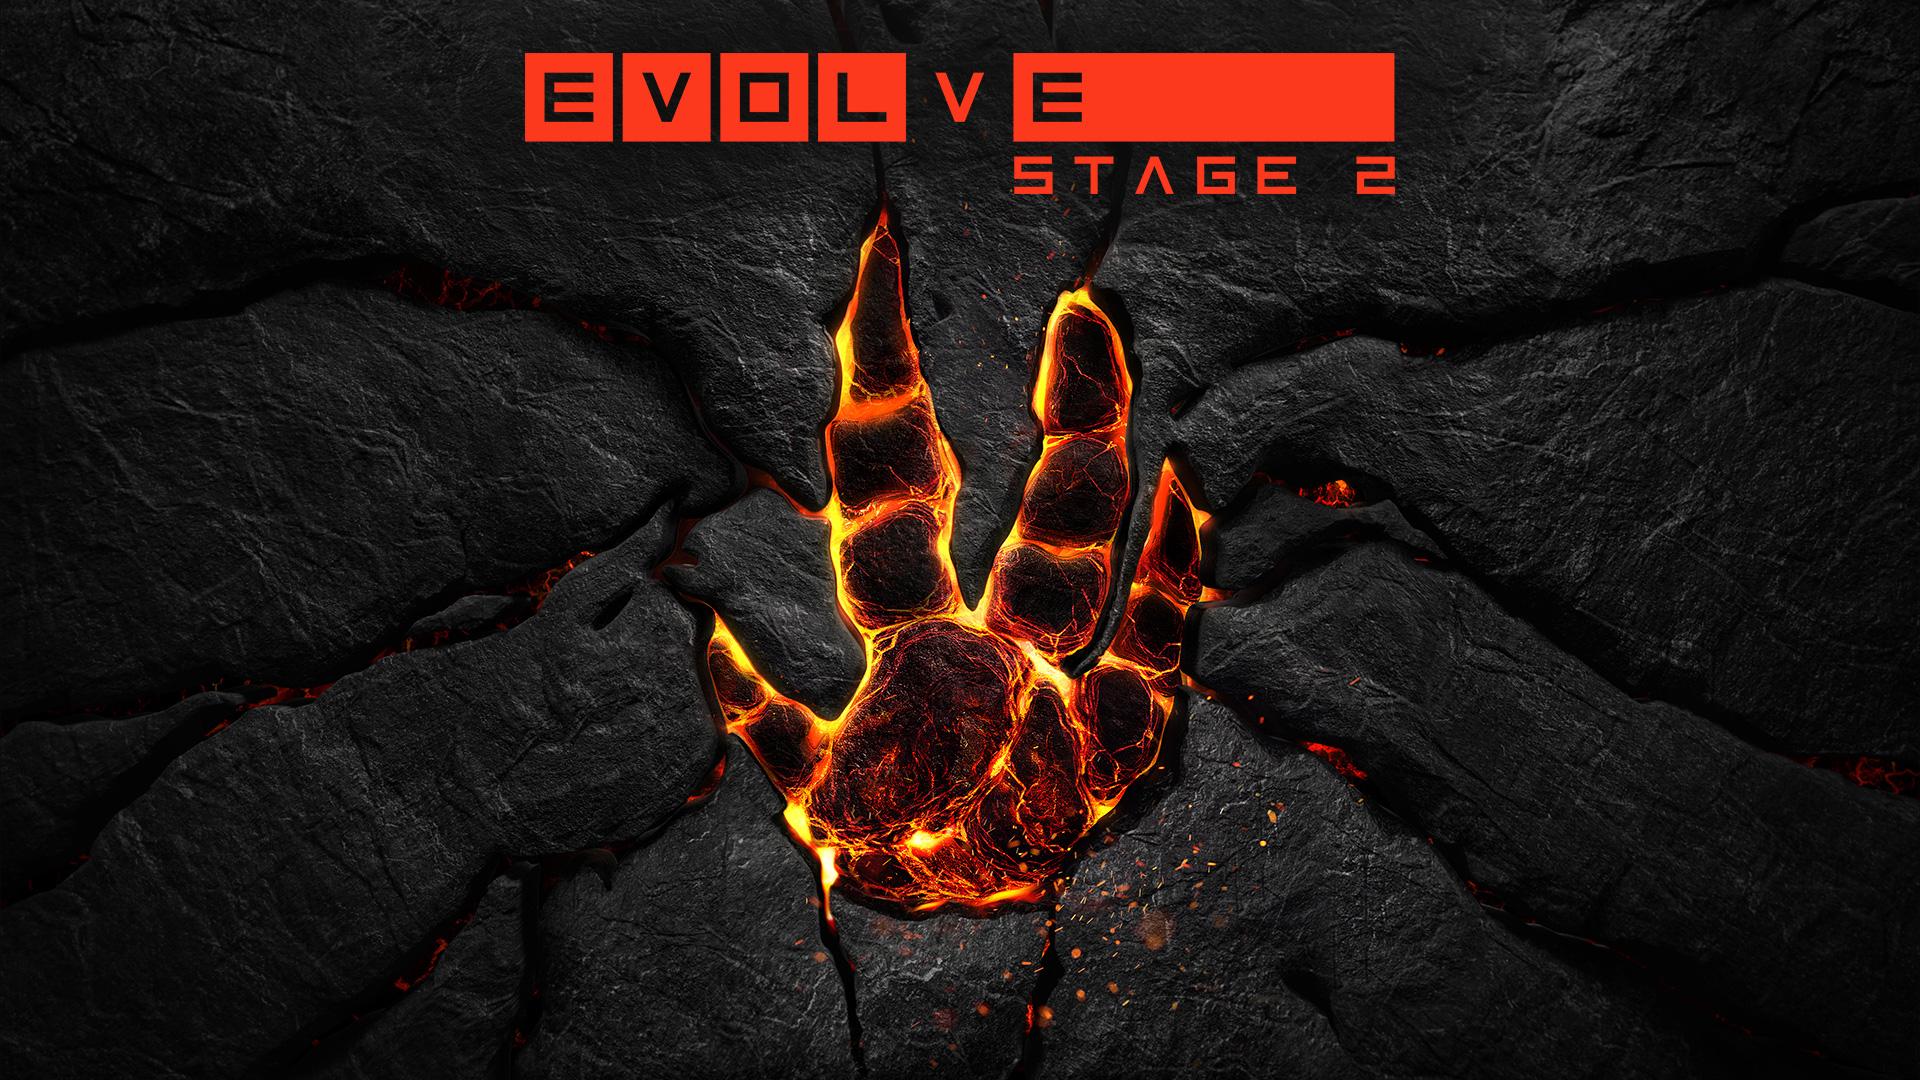 2K_EVOLVE_STAGE2_ARTWORK_LOGO.jpg